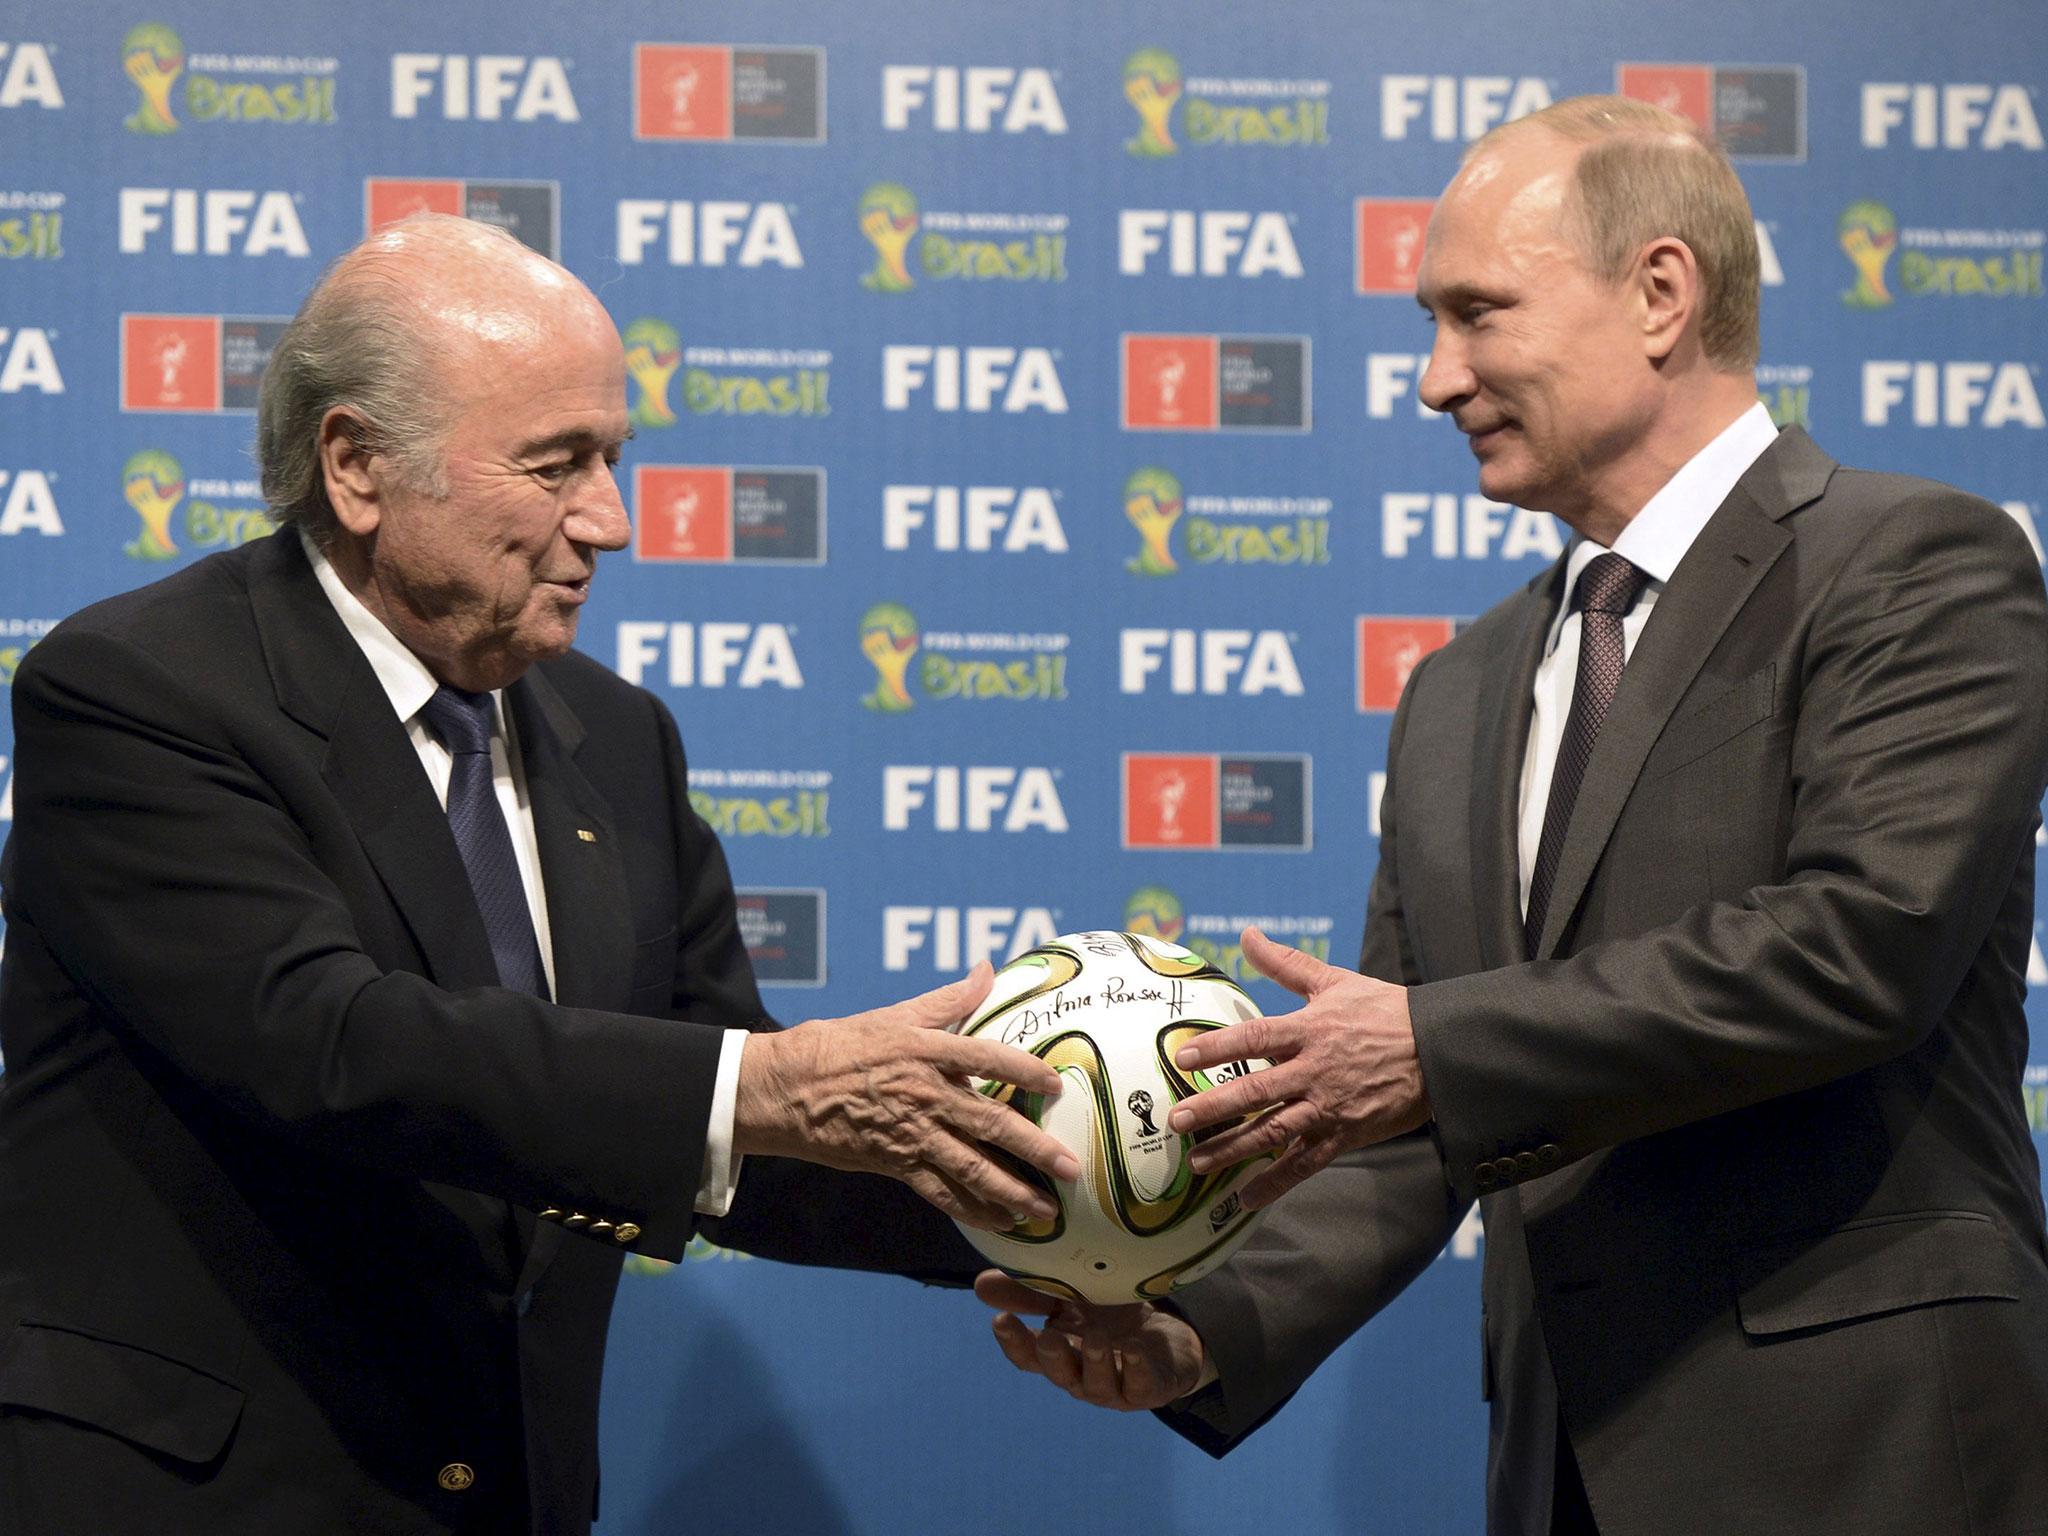 Football world cup 2018 statistics of divorce